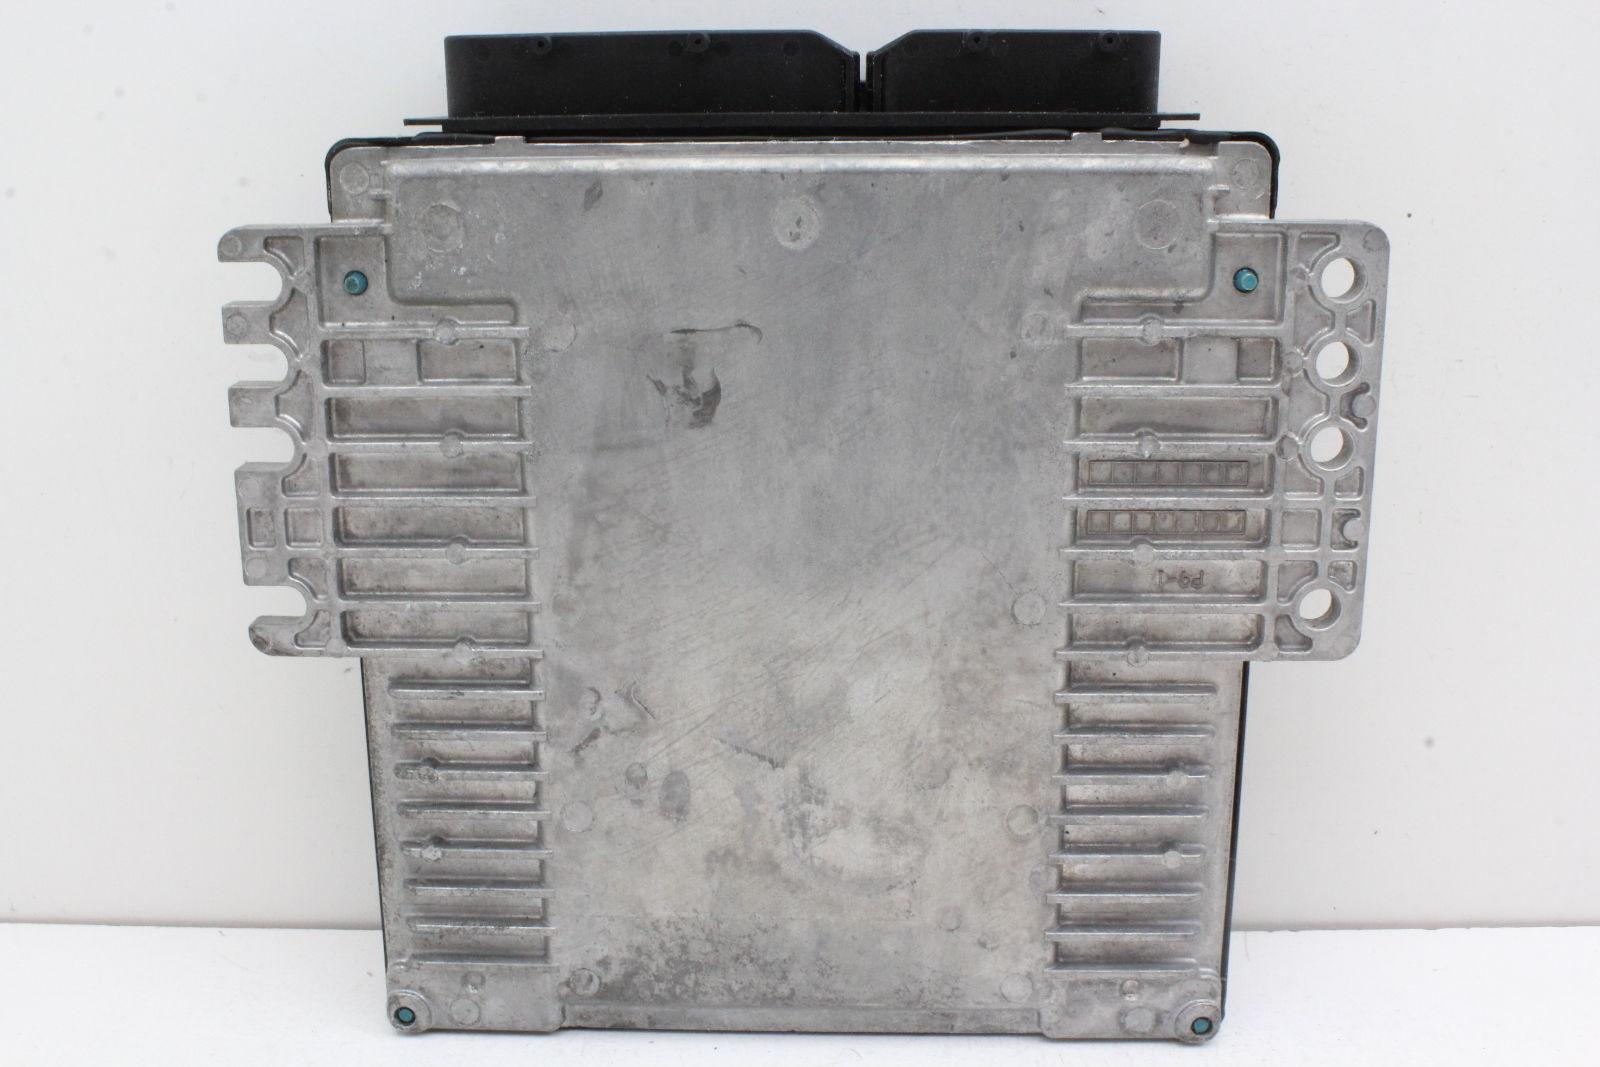 05 06 Altima MEC35-523 A1 Computer Brain Engine Control ECU ECM EBX Module